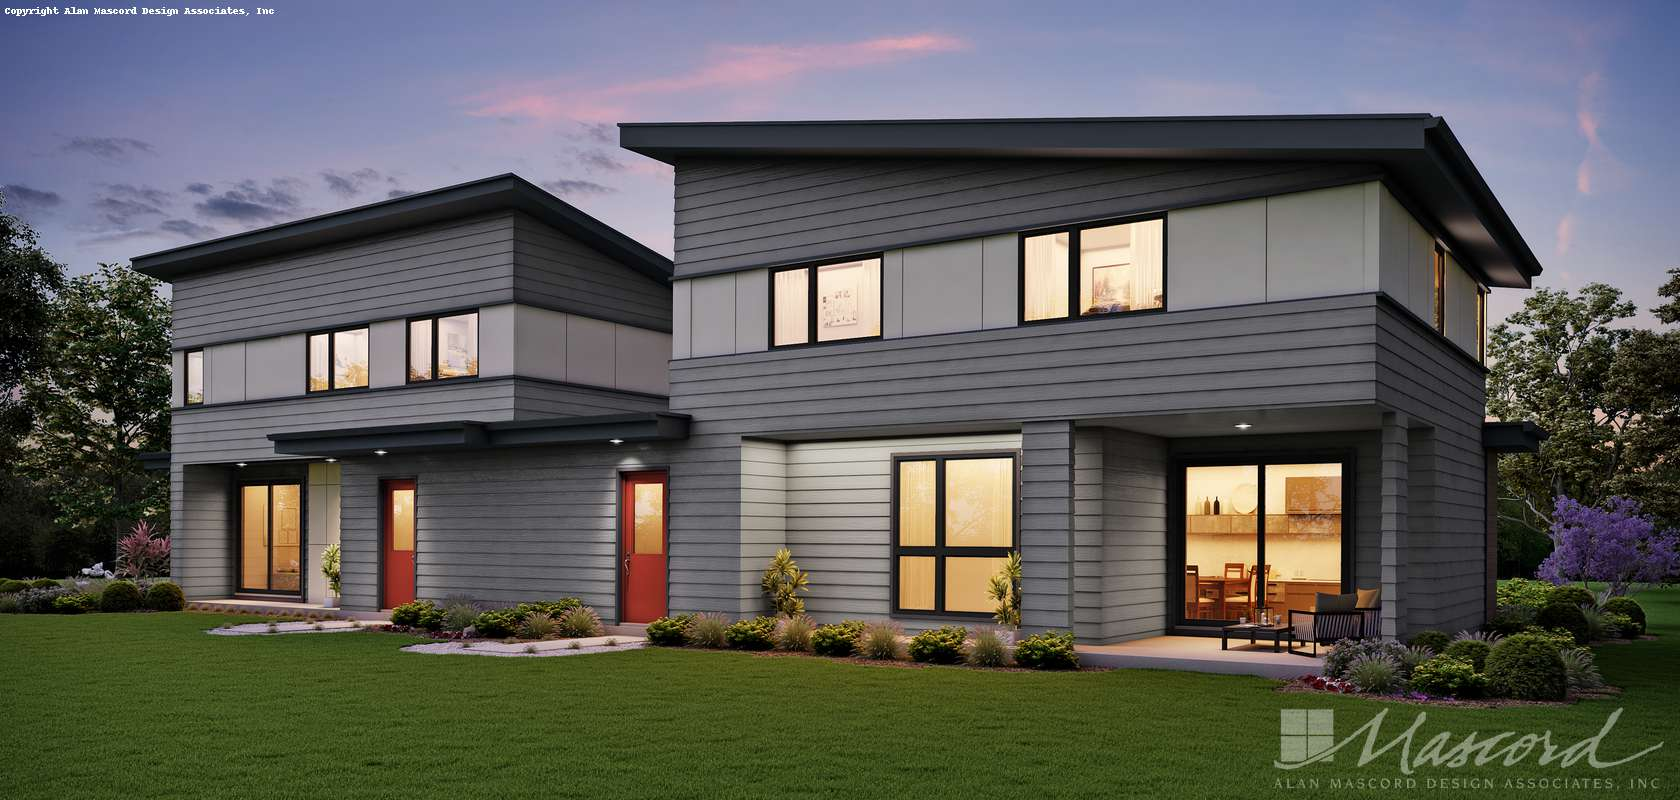 Mascord House Plan 4047: The Coen